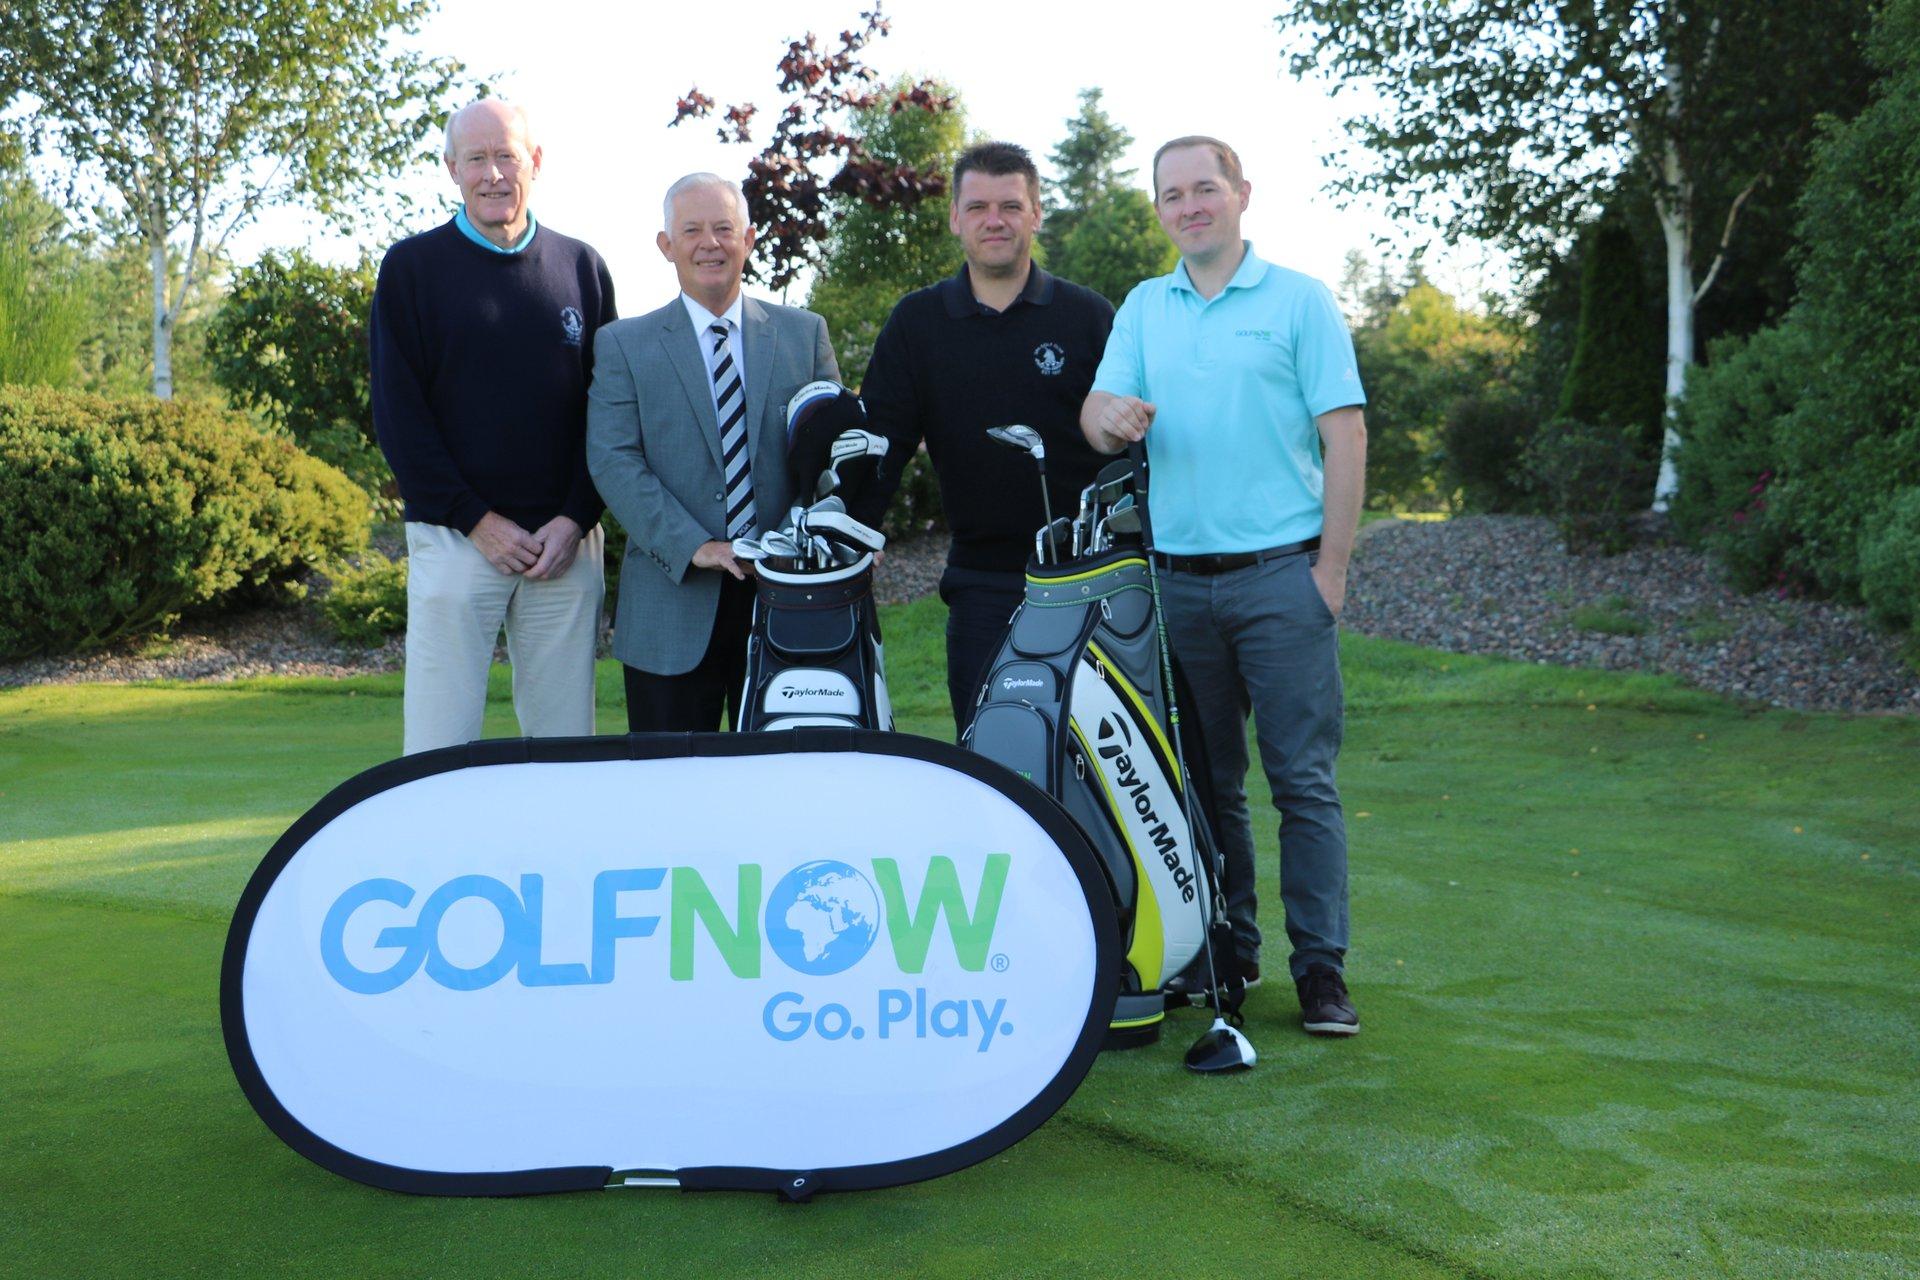 Golfnow Com Official Site | Today Hot Golfnow